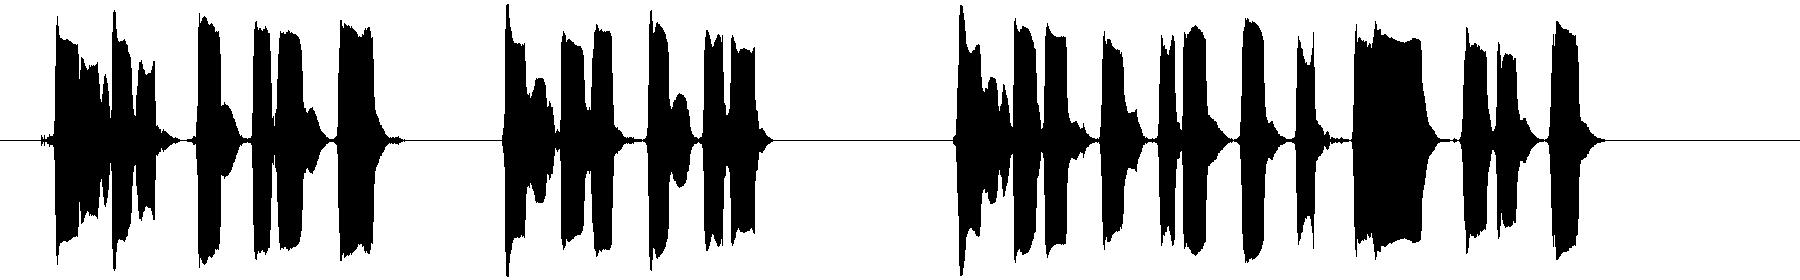 vedh sax lick 12 cm 124bpm